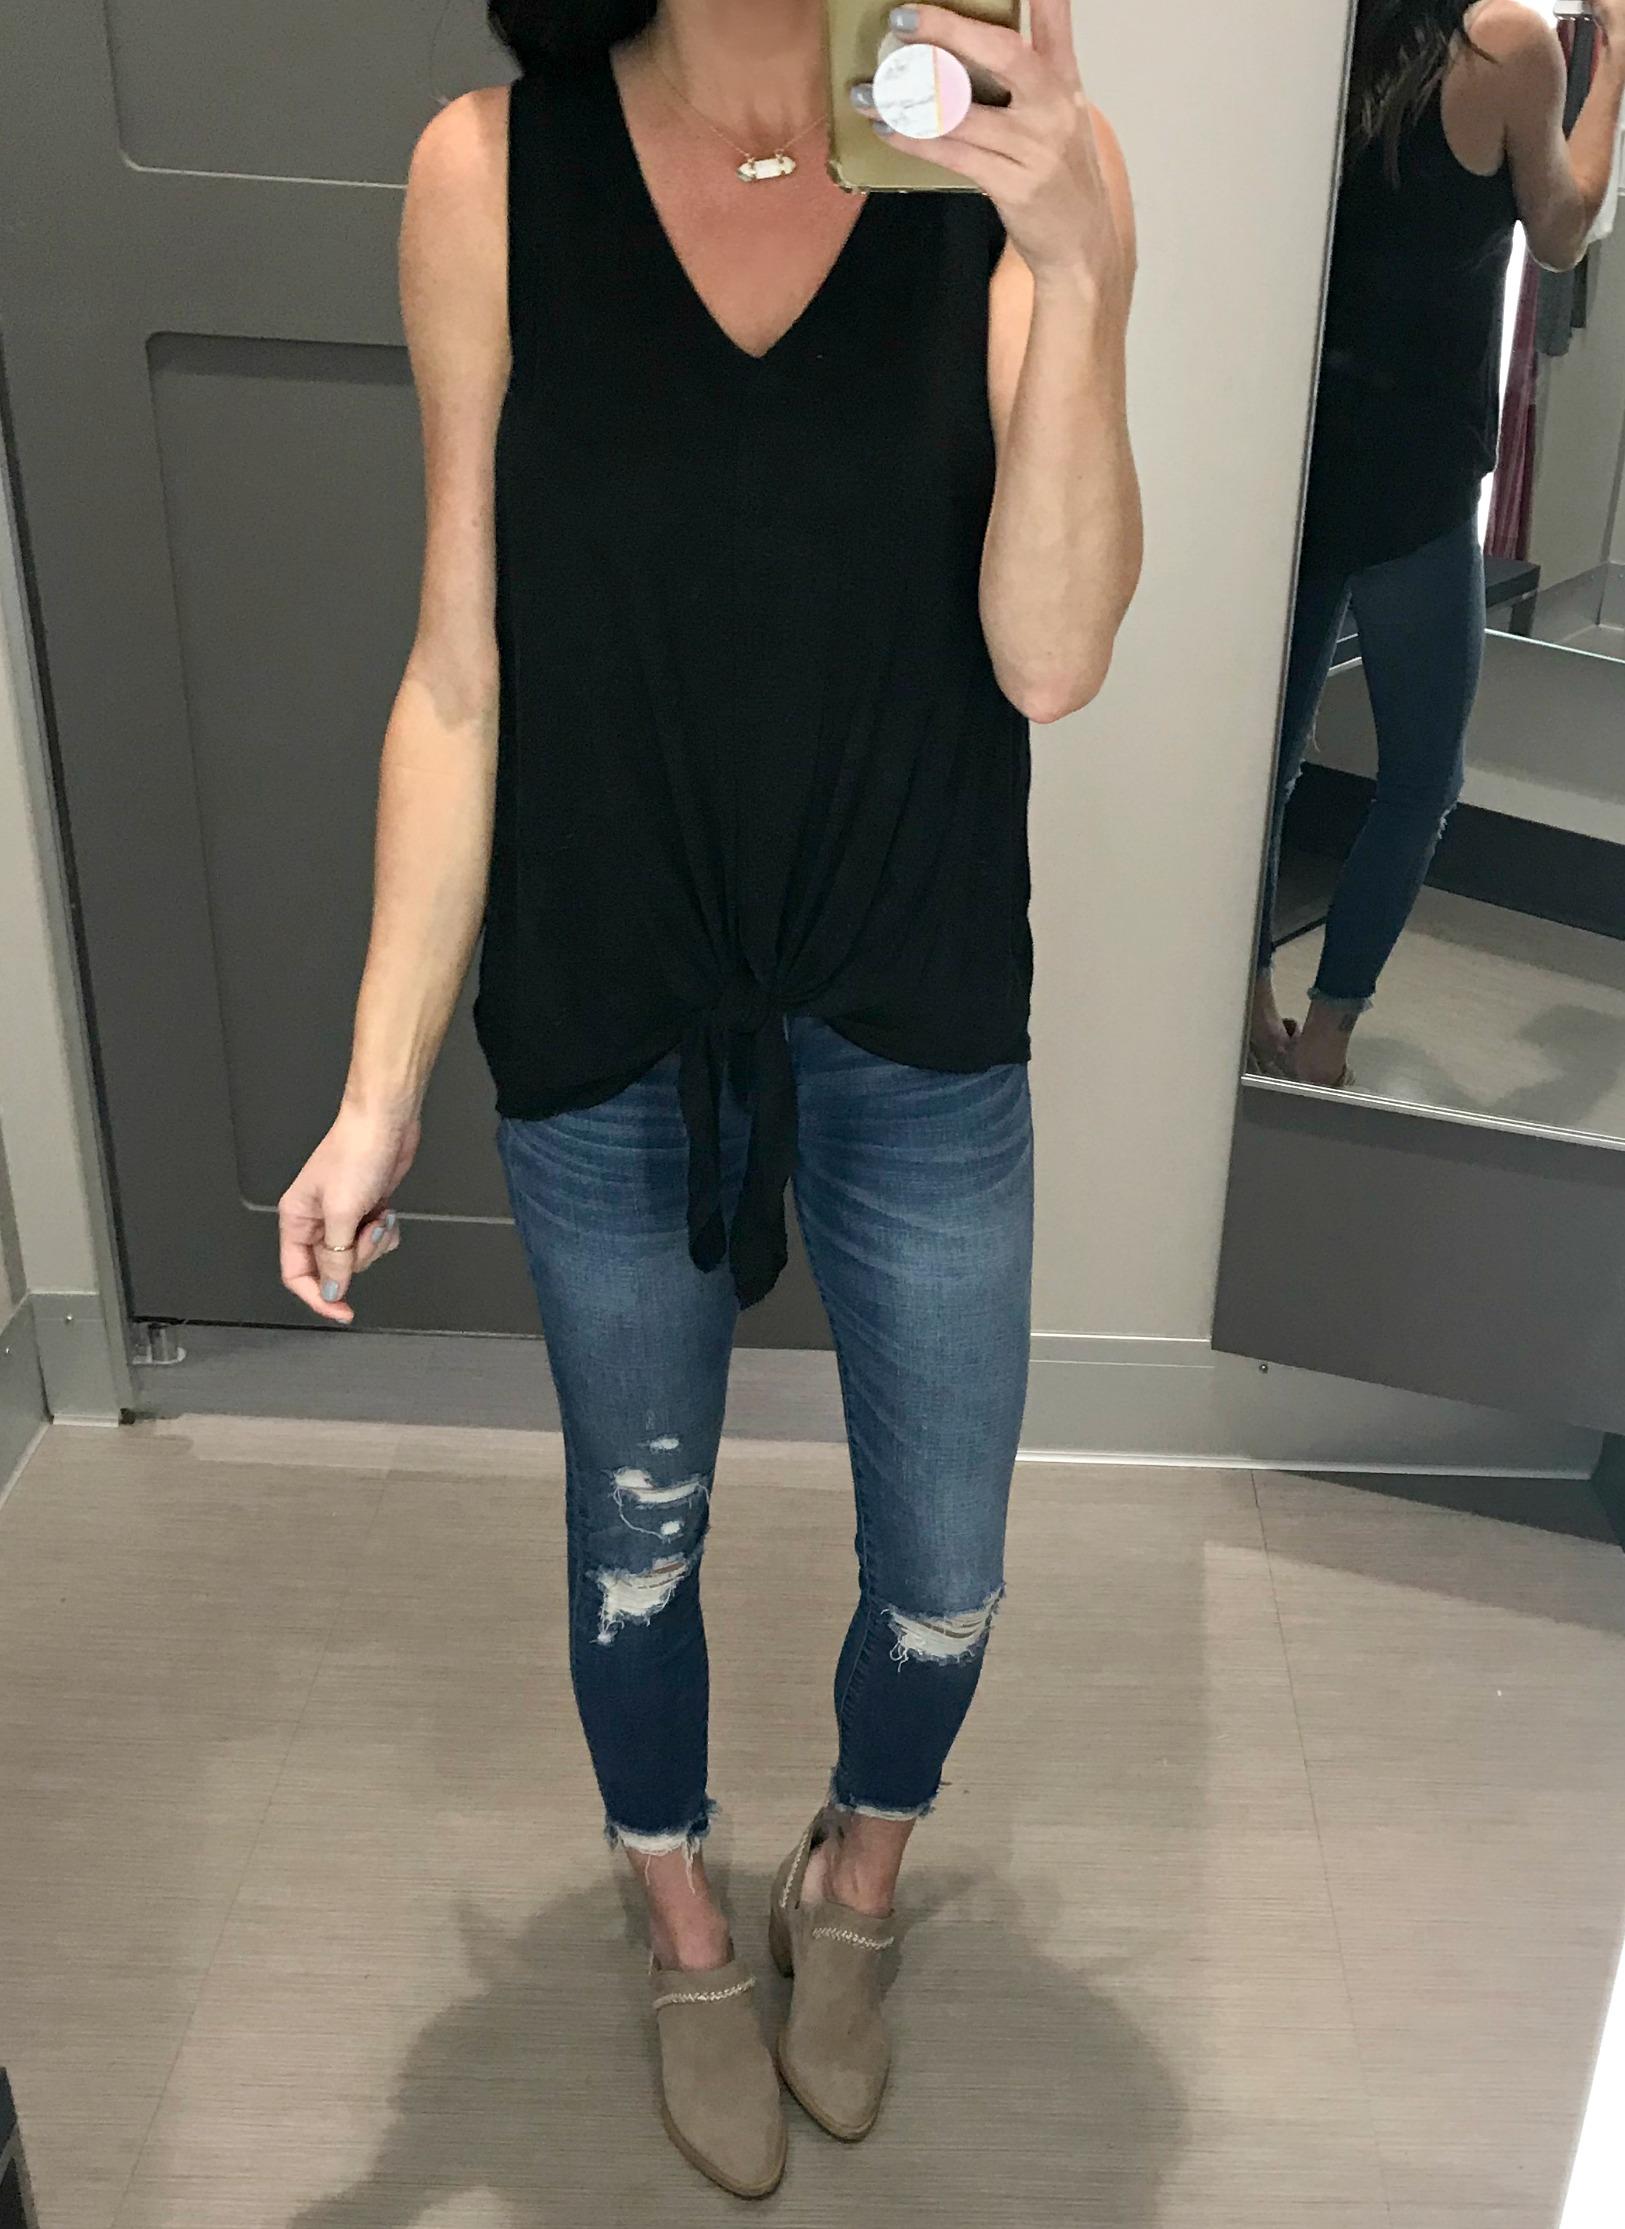 Black Tank, Jeans, Booties